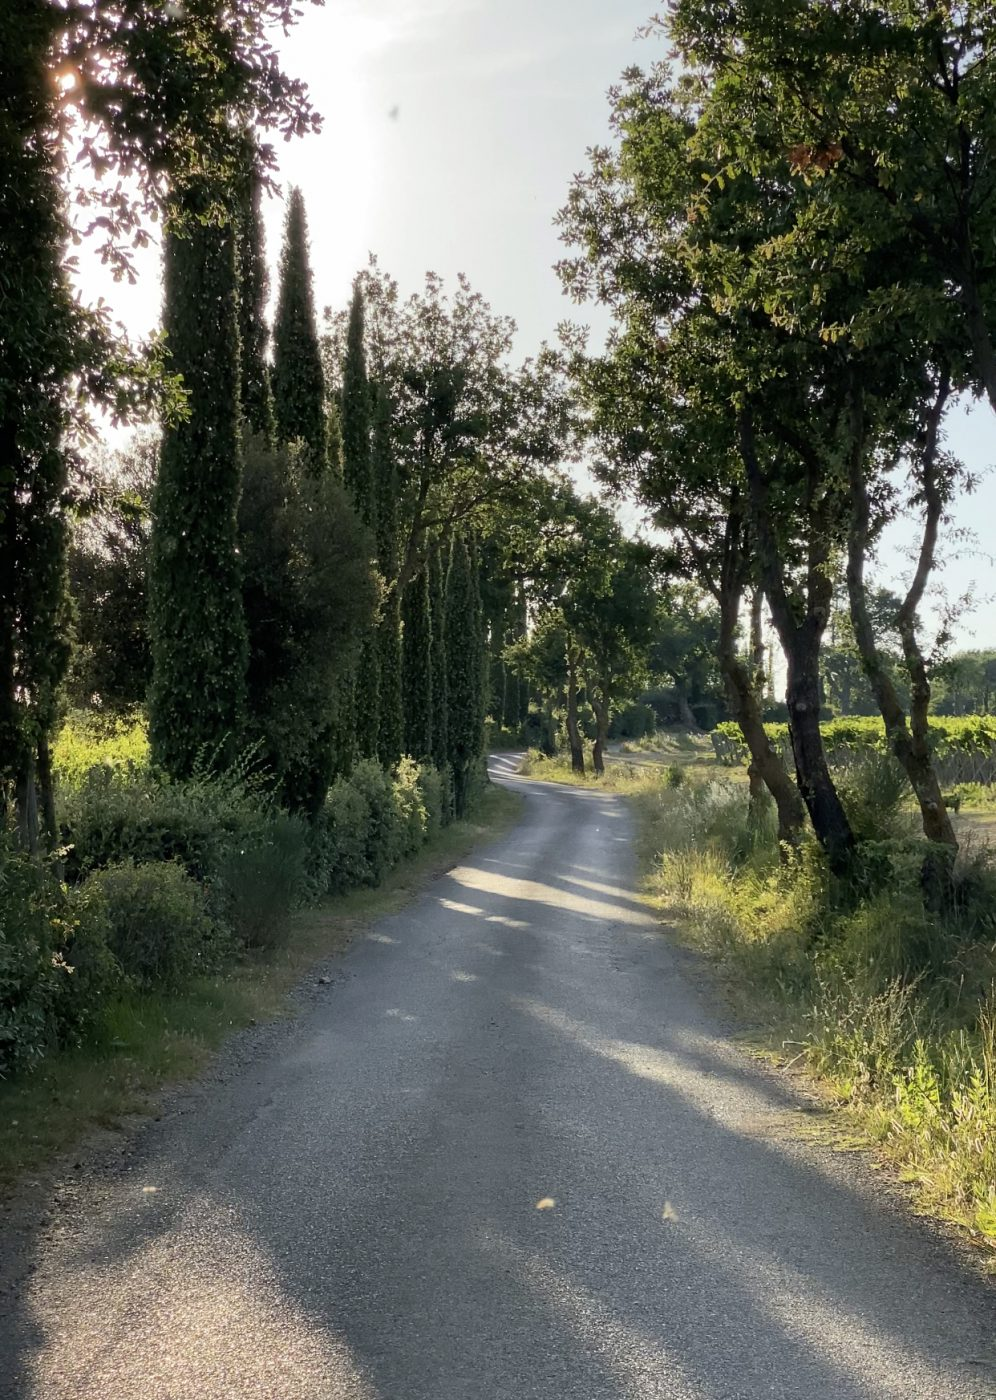 Tuscany during springtime